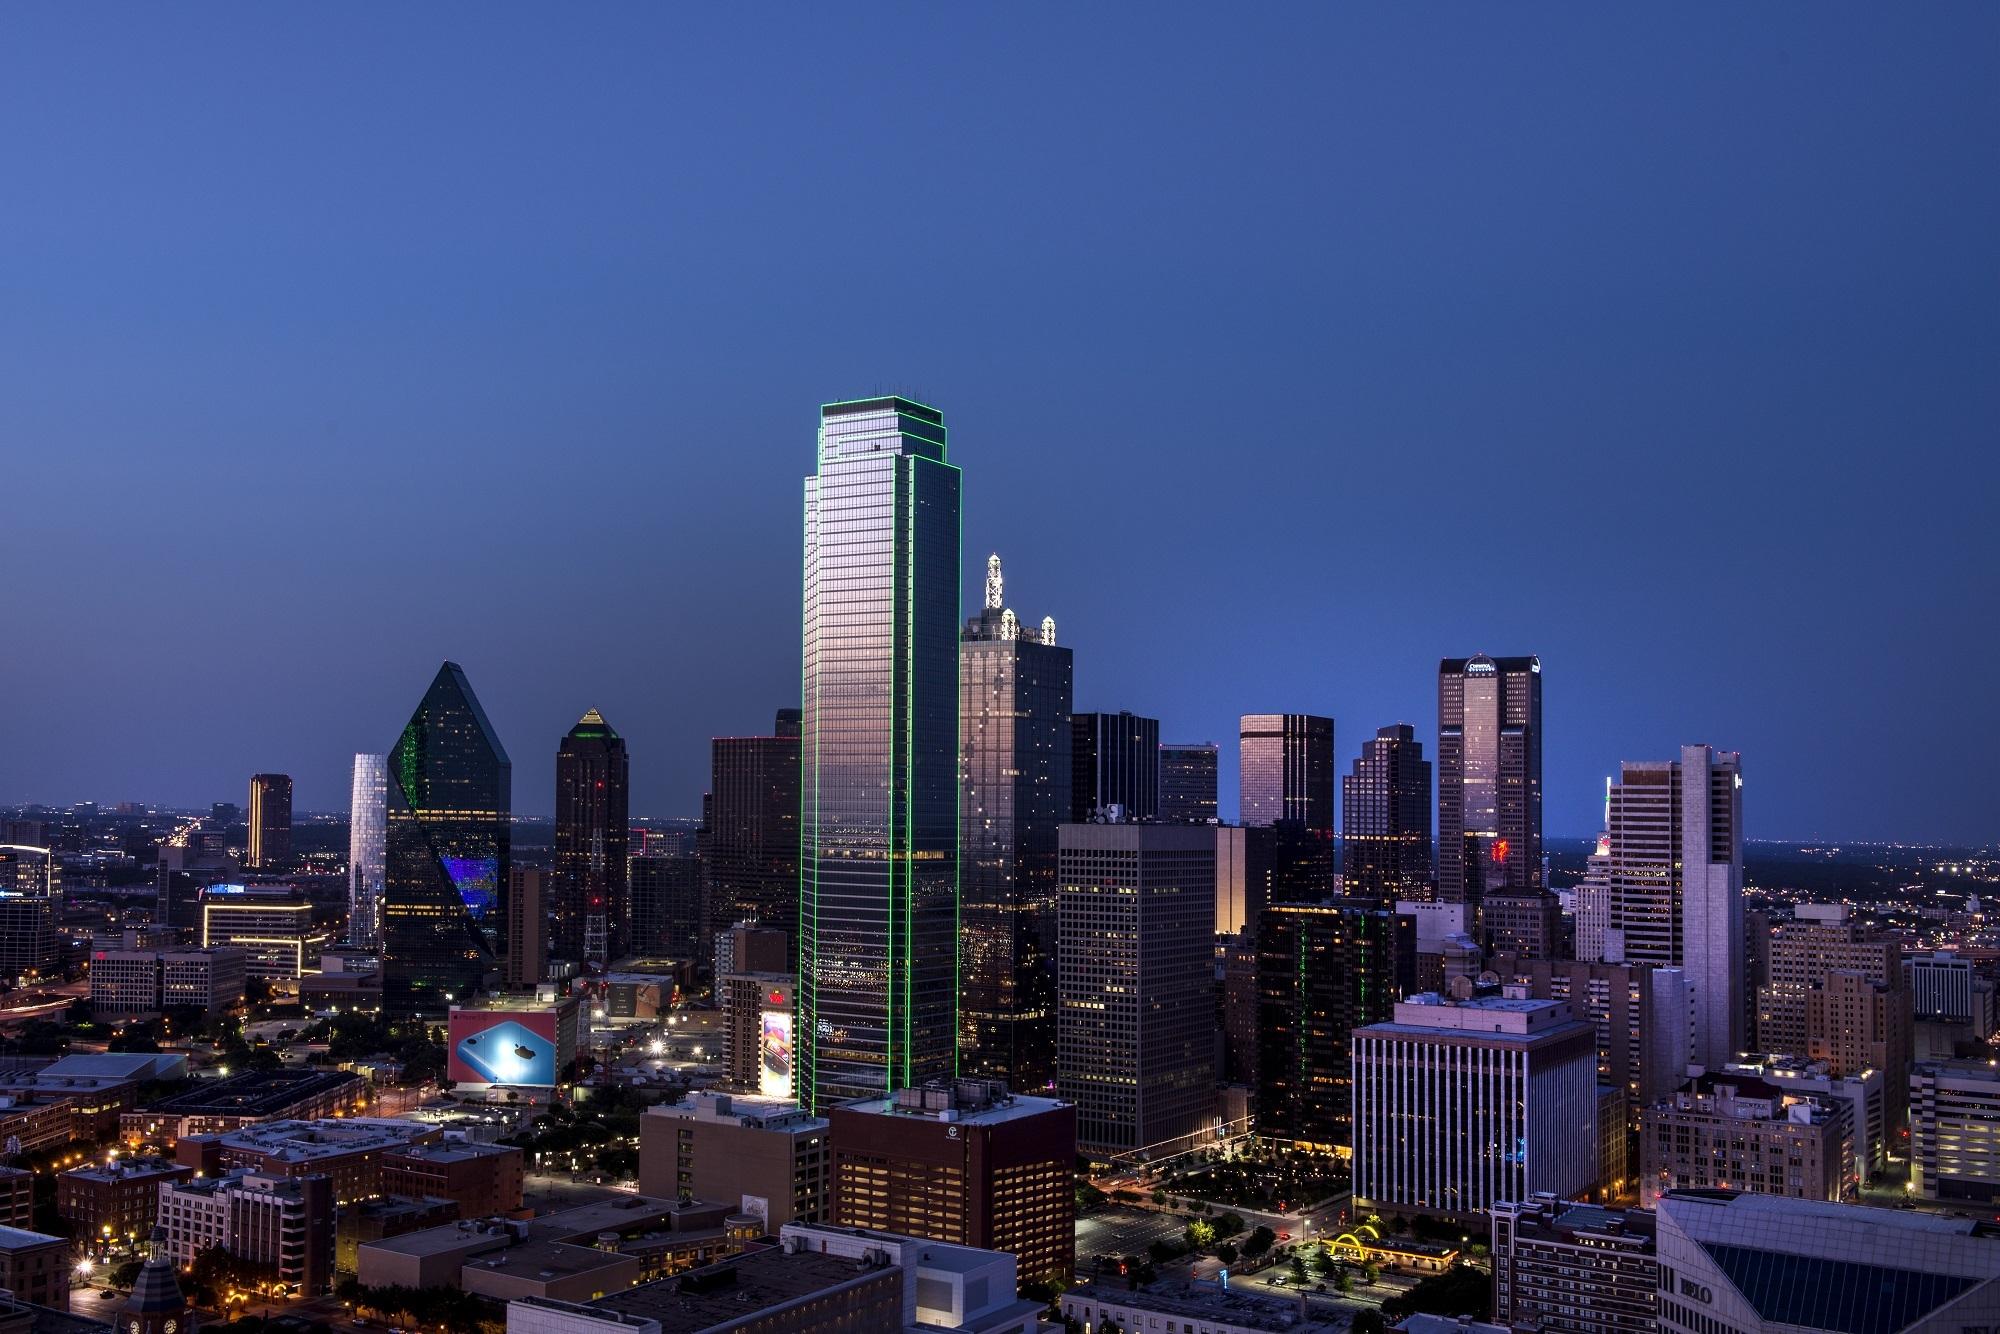 Block Earth Texas : Free images landscape horizon architecture sunset